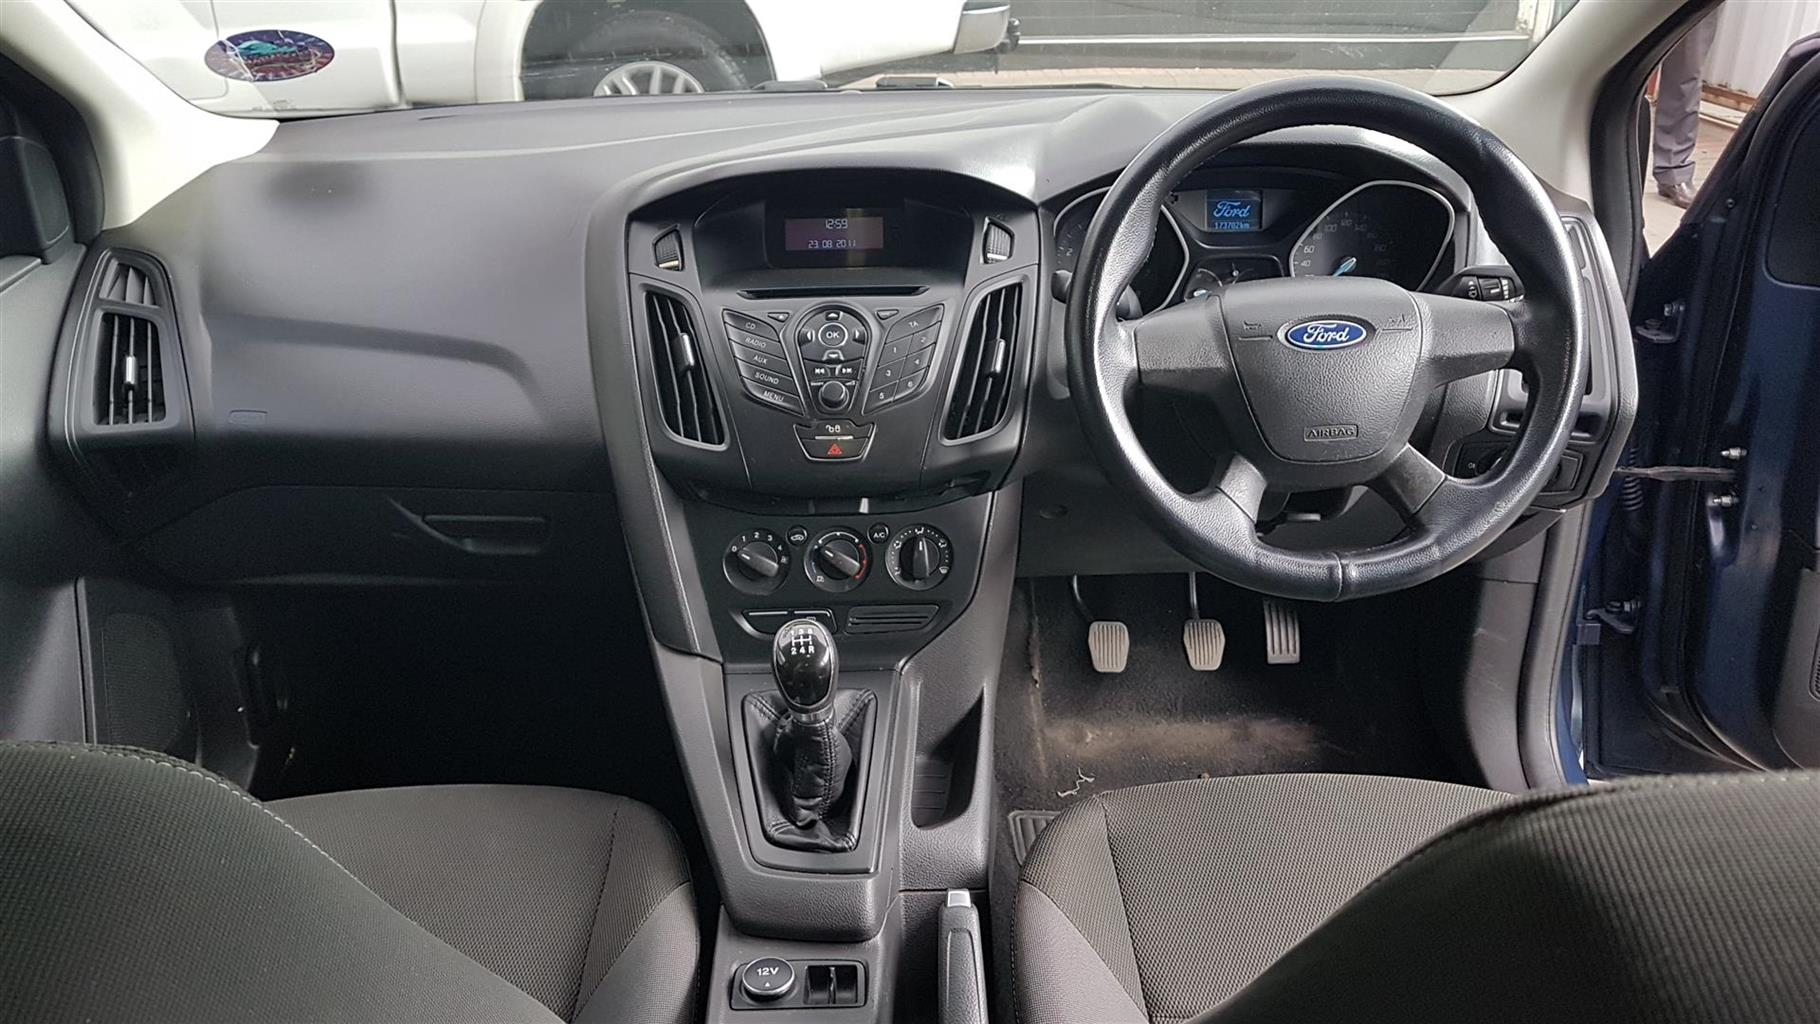 2012 Ford Focus hatch 1.6 Trend